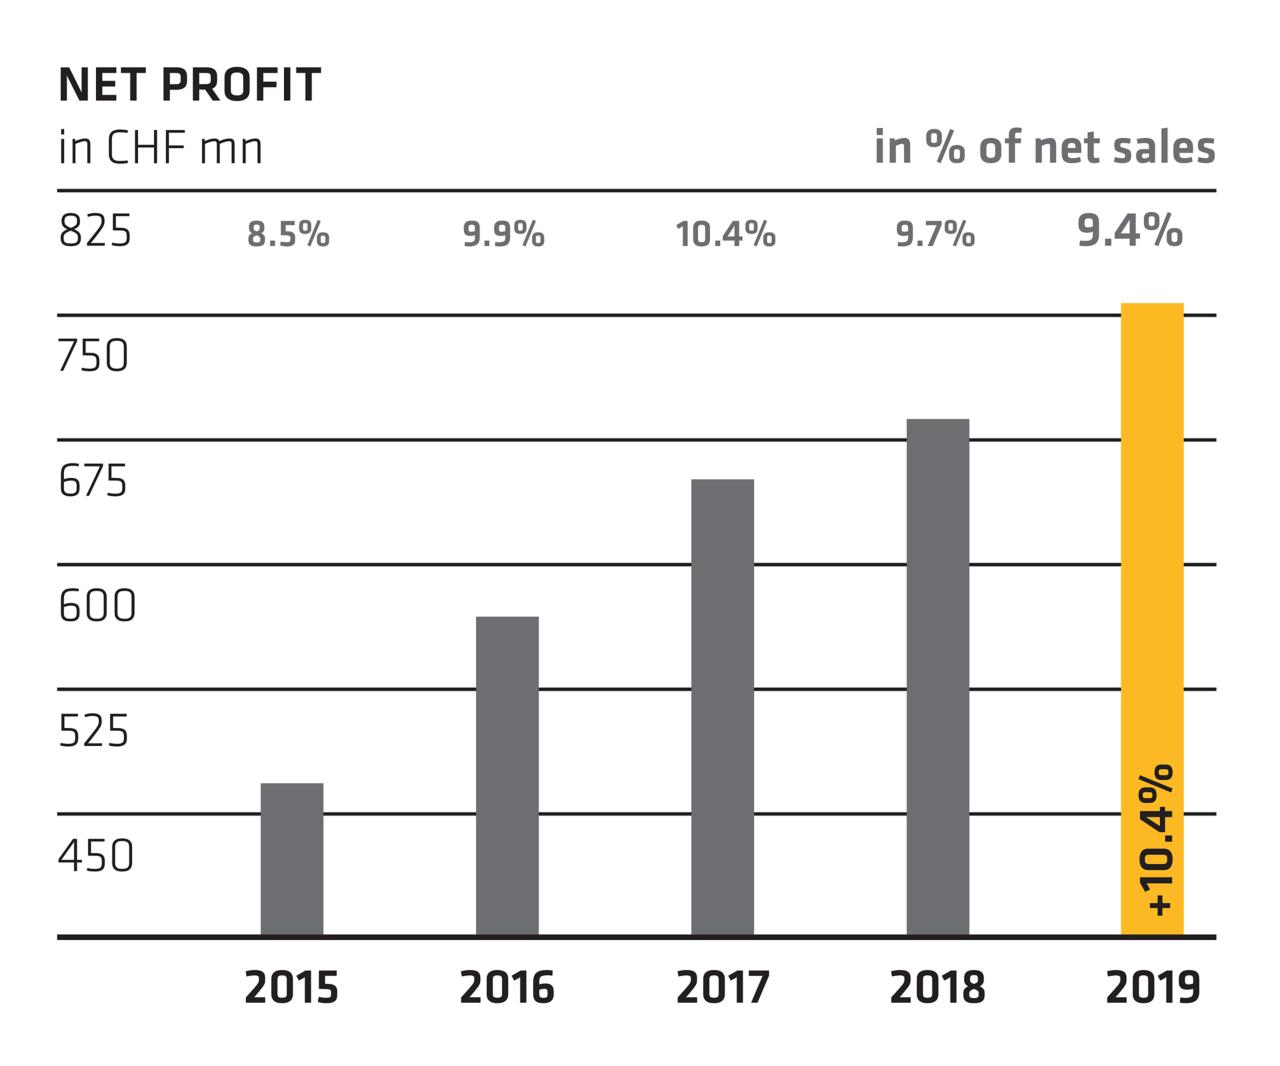 Net profit - Annual Report 2019